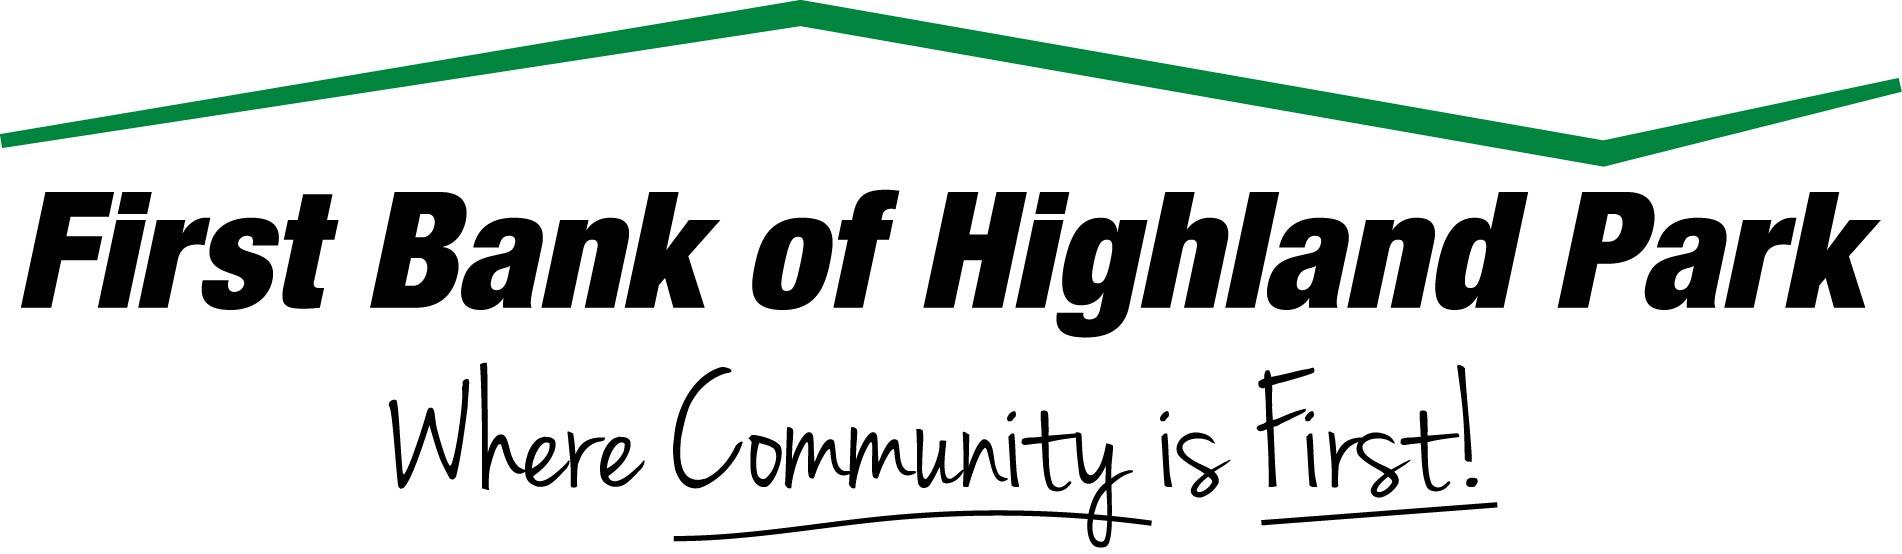 First bank highland park logo 2015_FBHP_LogoTagline